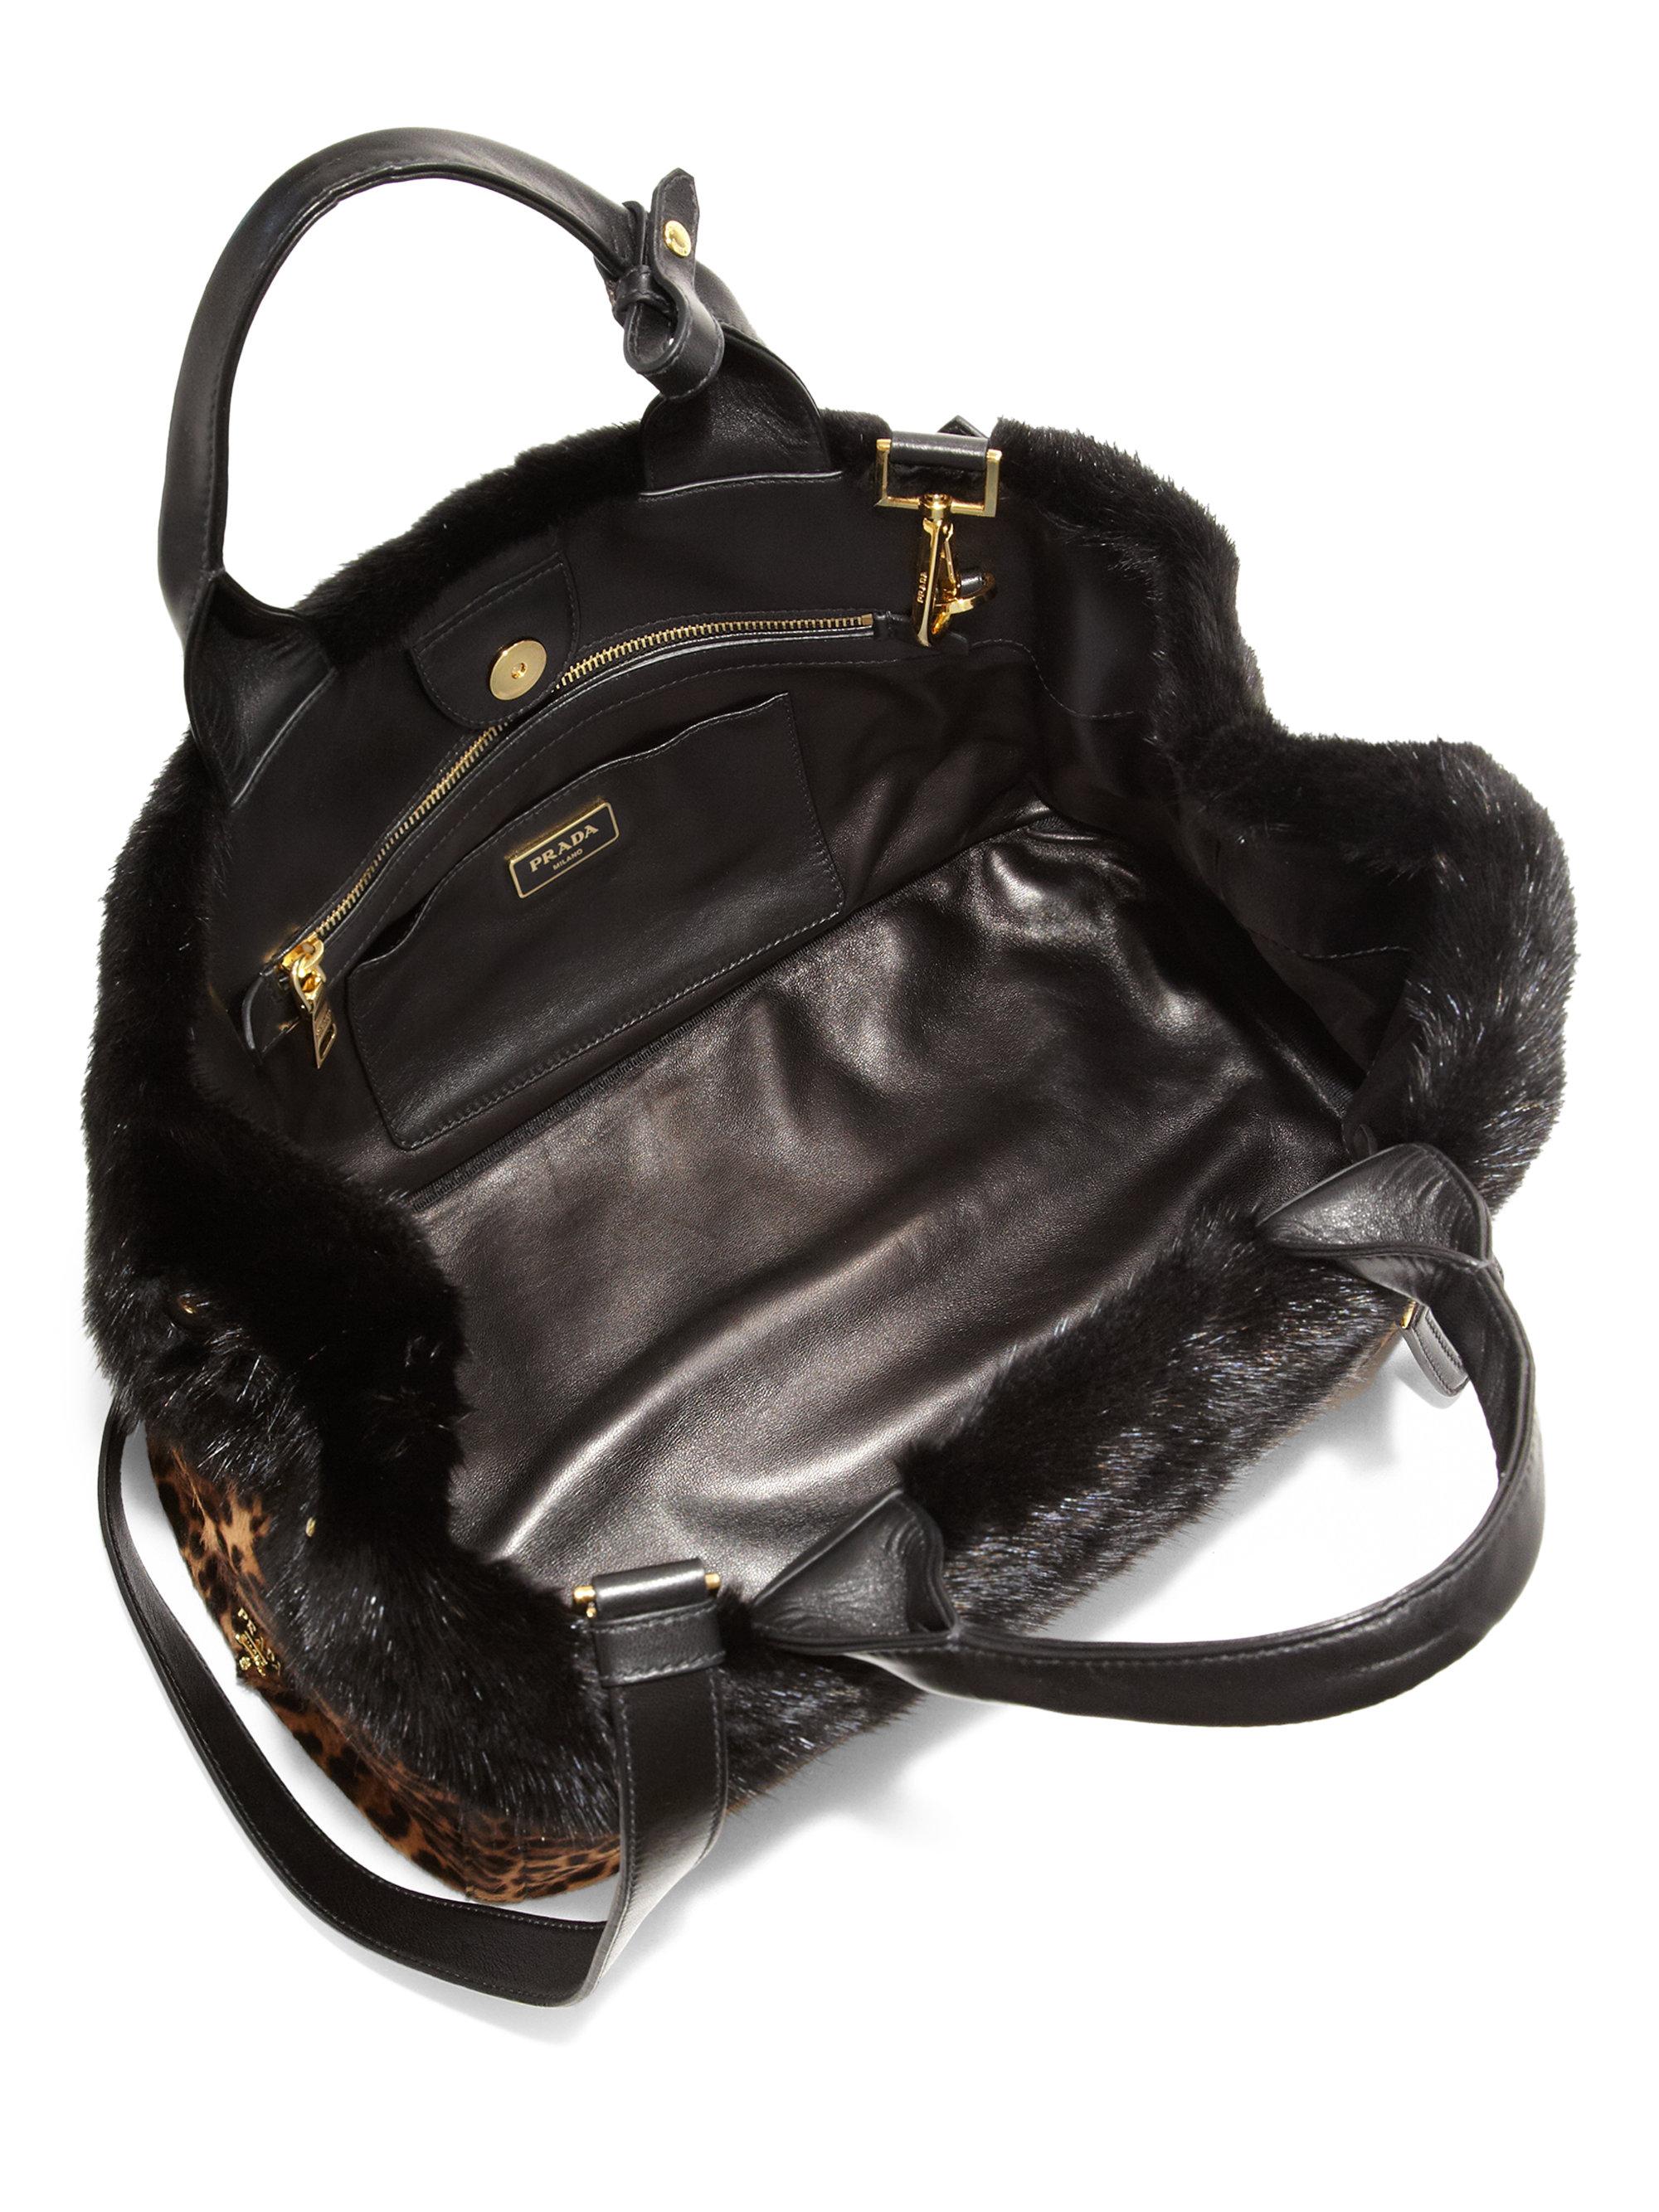 best faks - Prada Cavallino \u0026amp; Mink Fur Garden Bag in Animal (LEOPARD)   Lyst